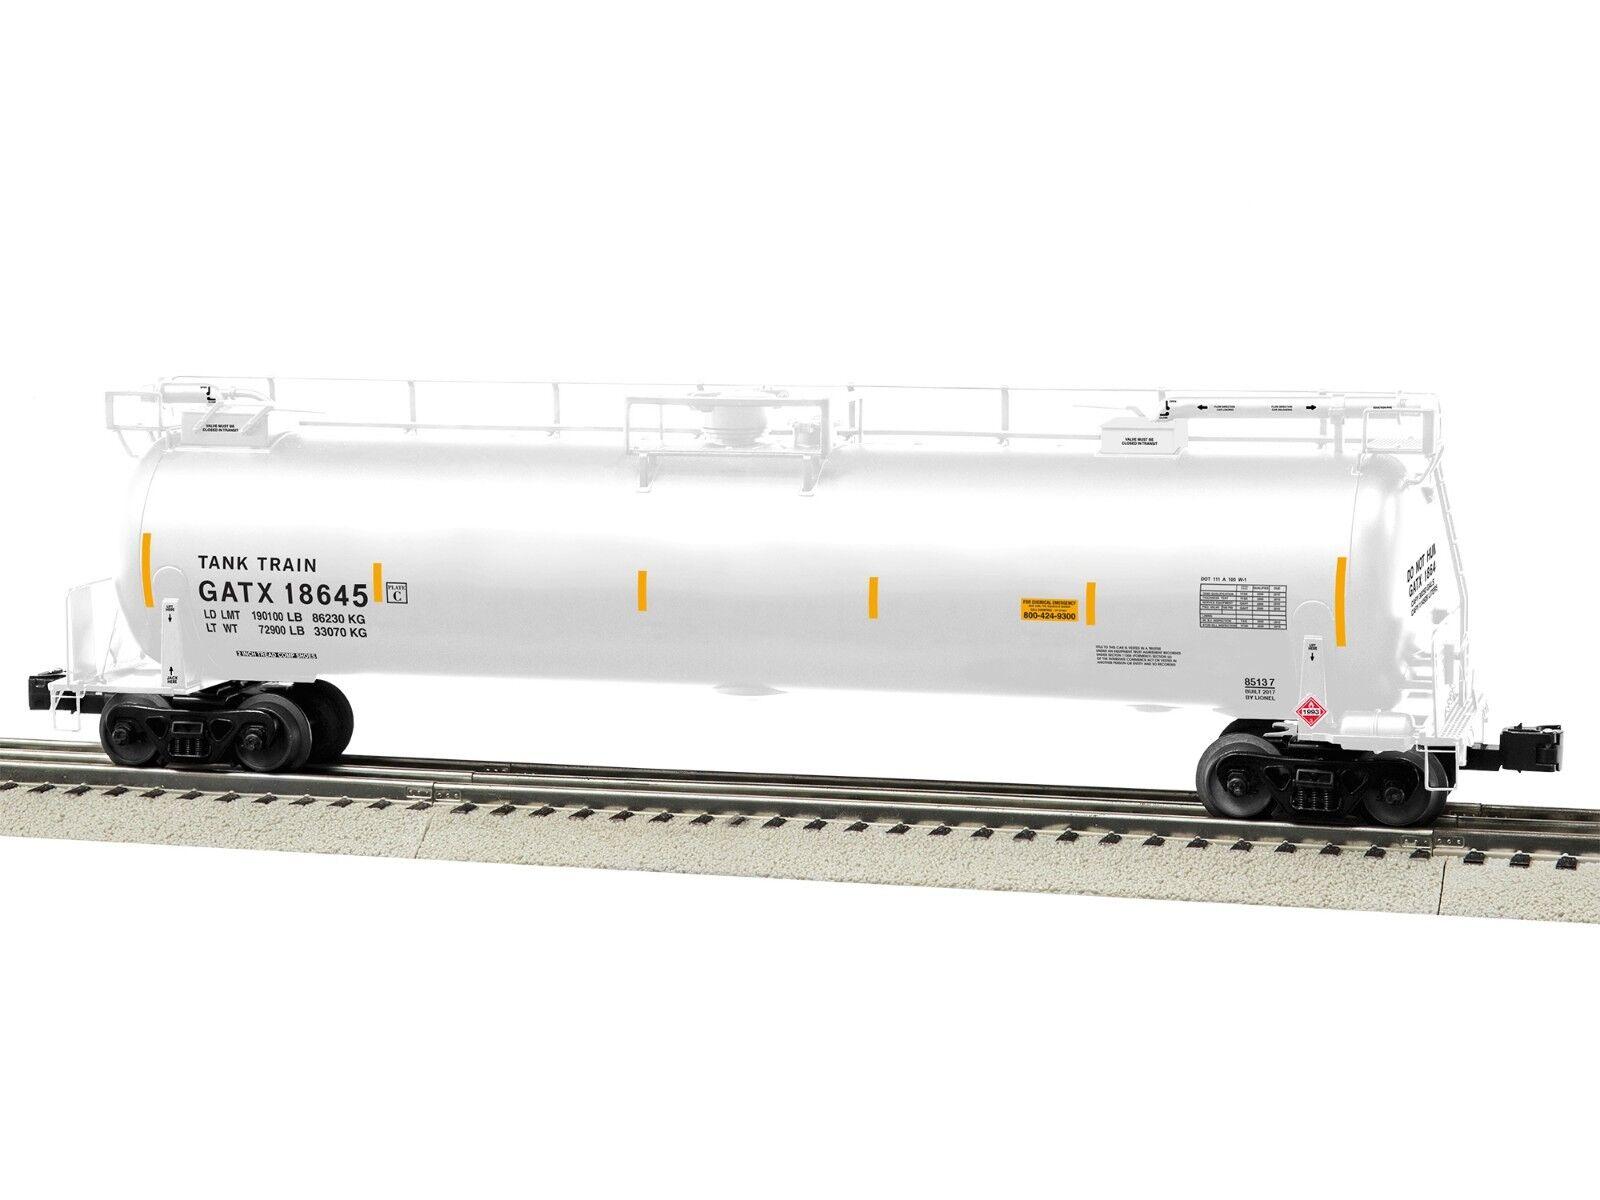 OGaugeLionelGATX tanktrain intermedio AUTO  18645